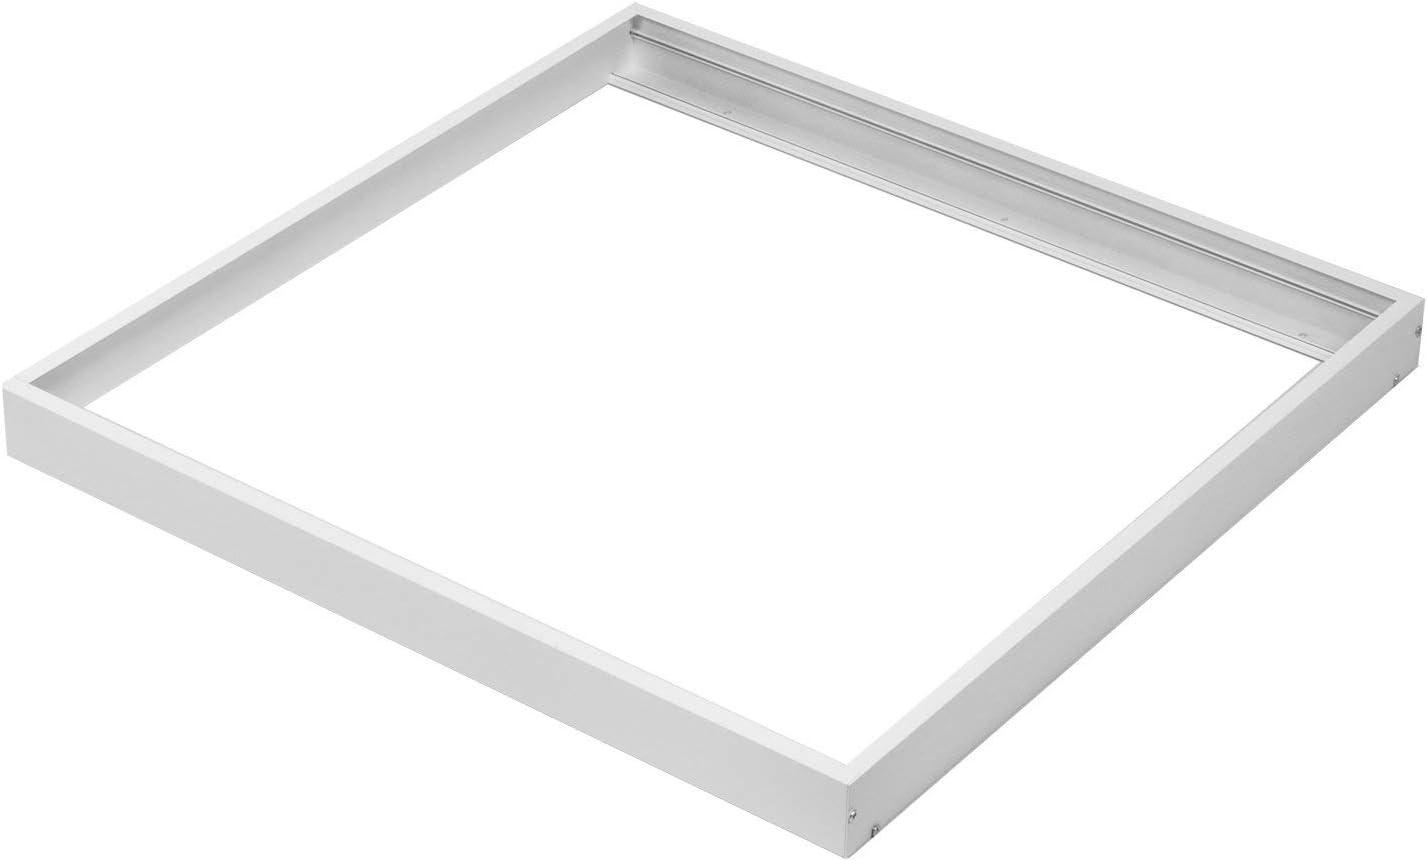 Led4U LD157montaje Juego de montaje Marco panel LED 60x 60accesorios Juego de montaje techo Montaje Kit de montaje (montaje de pared)